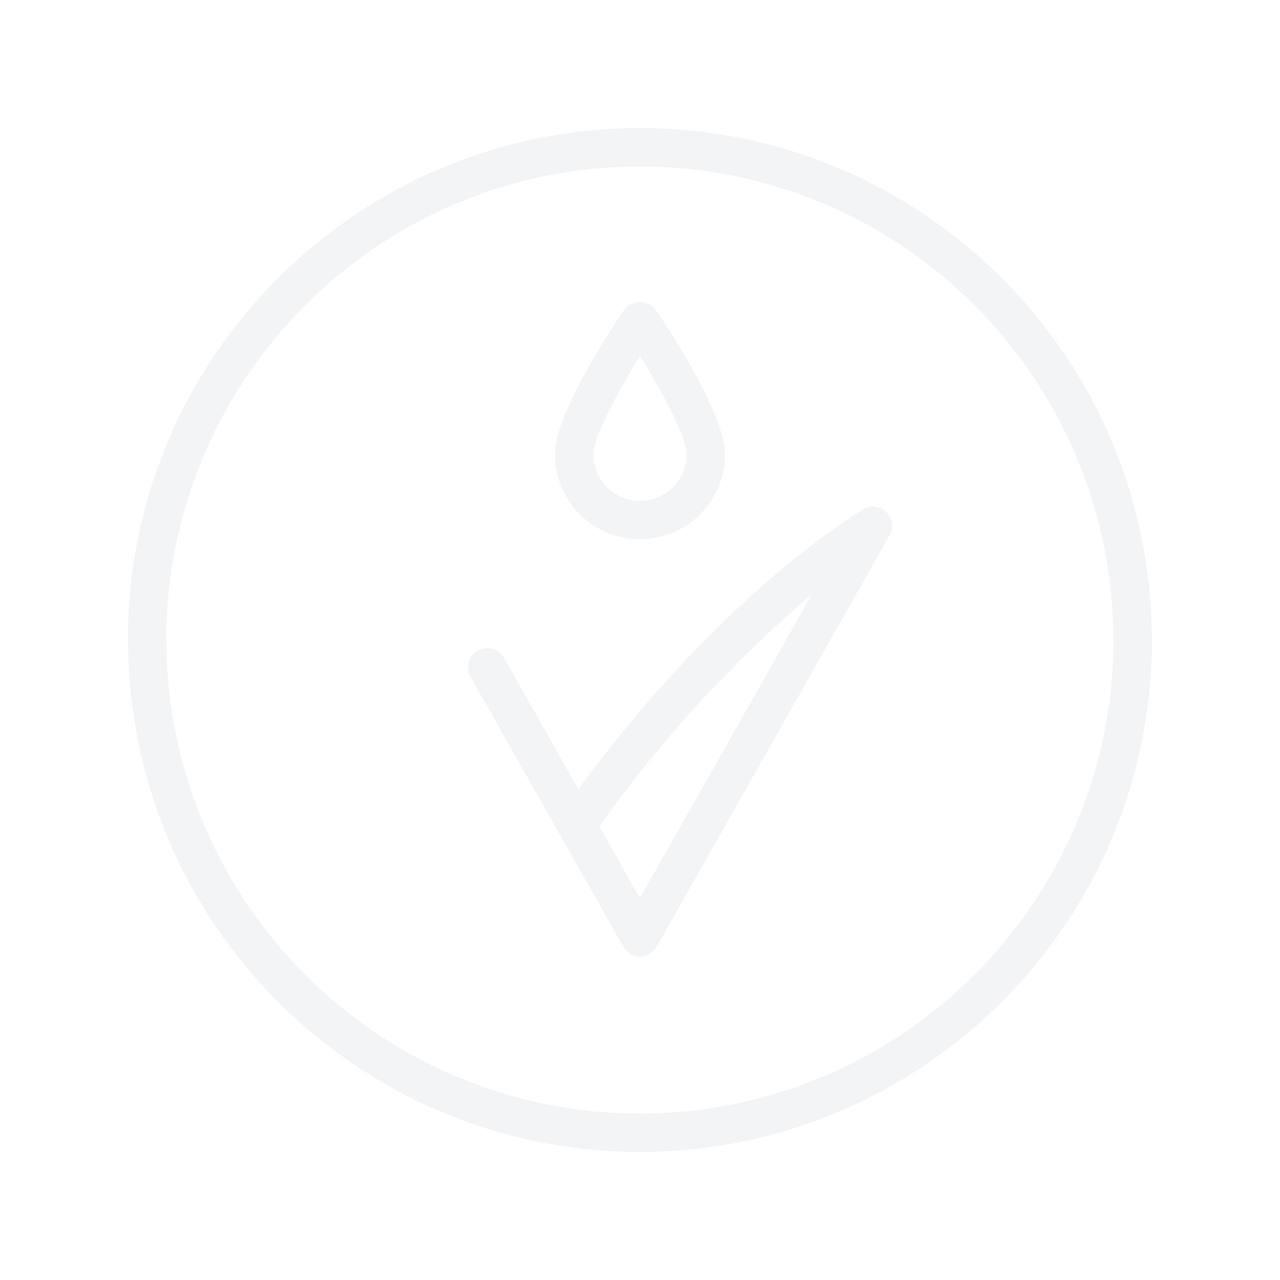 REAL TECHNIQUES Crush Volume II 302 Blush Brush